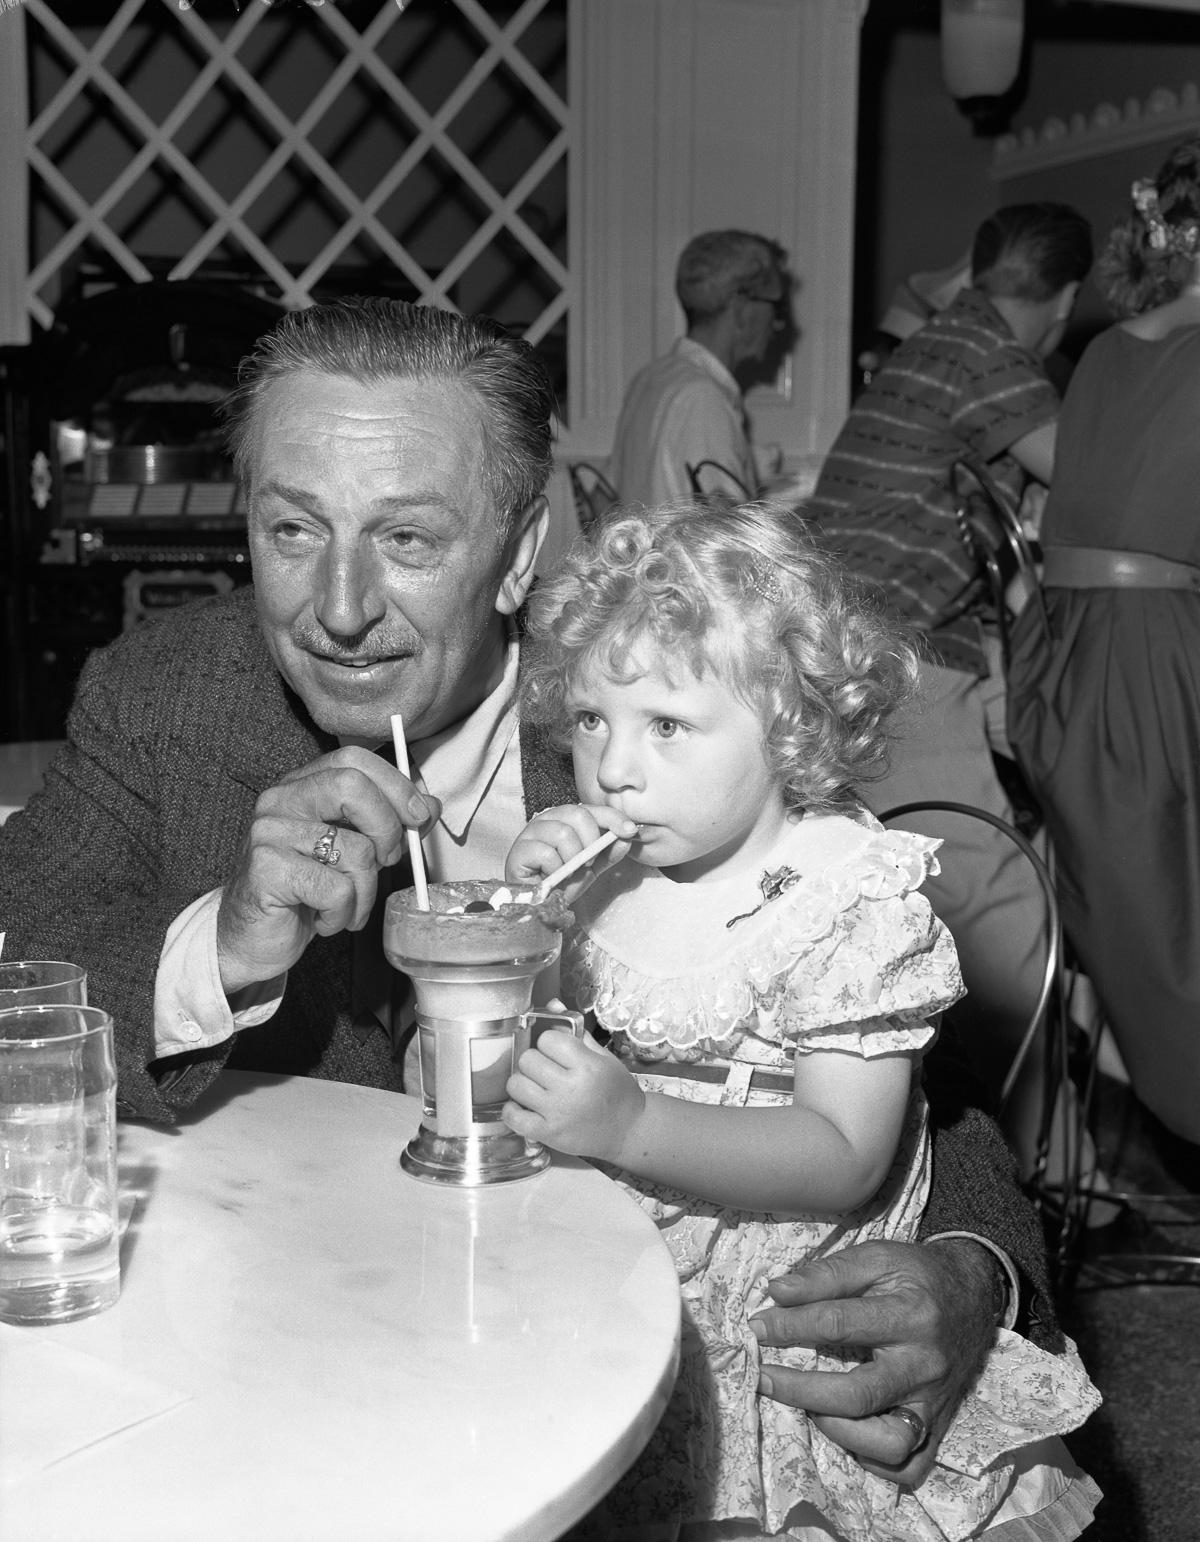 Walt Disney Sharing Ice Cream Soda with Little Girl